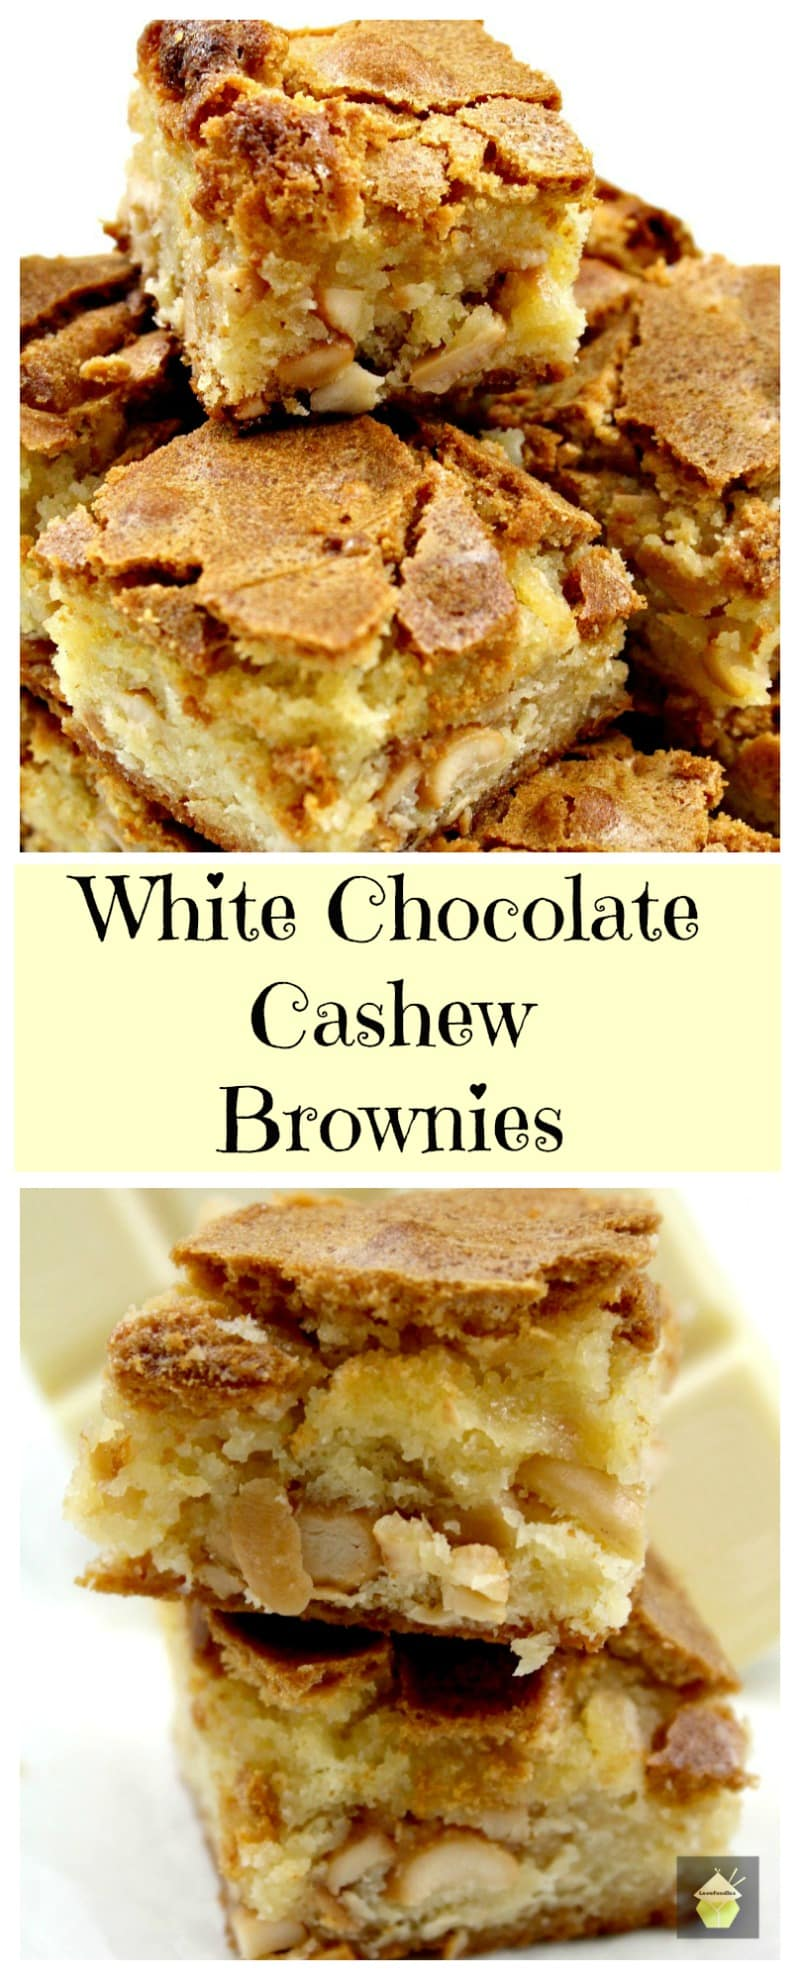 White Chocolate Cashew Brownies – Lovefoodies